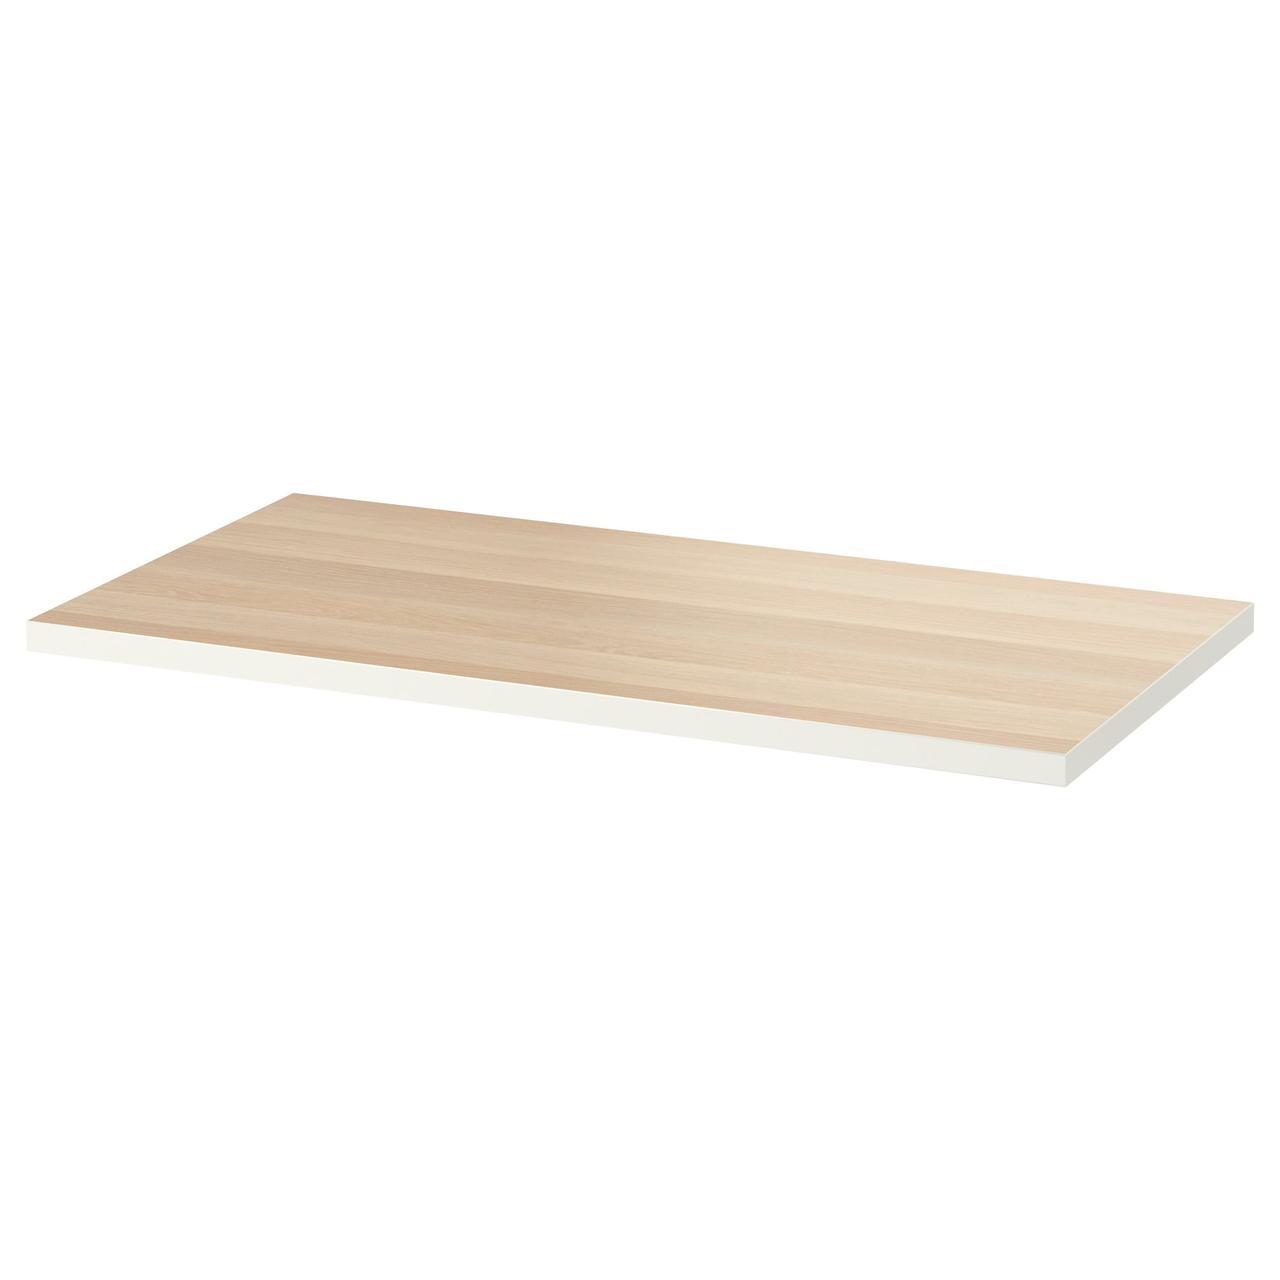 Столешница IKEA LINNMON 120x60 см беленый дуб 803.537.38